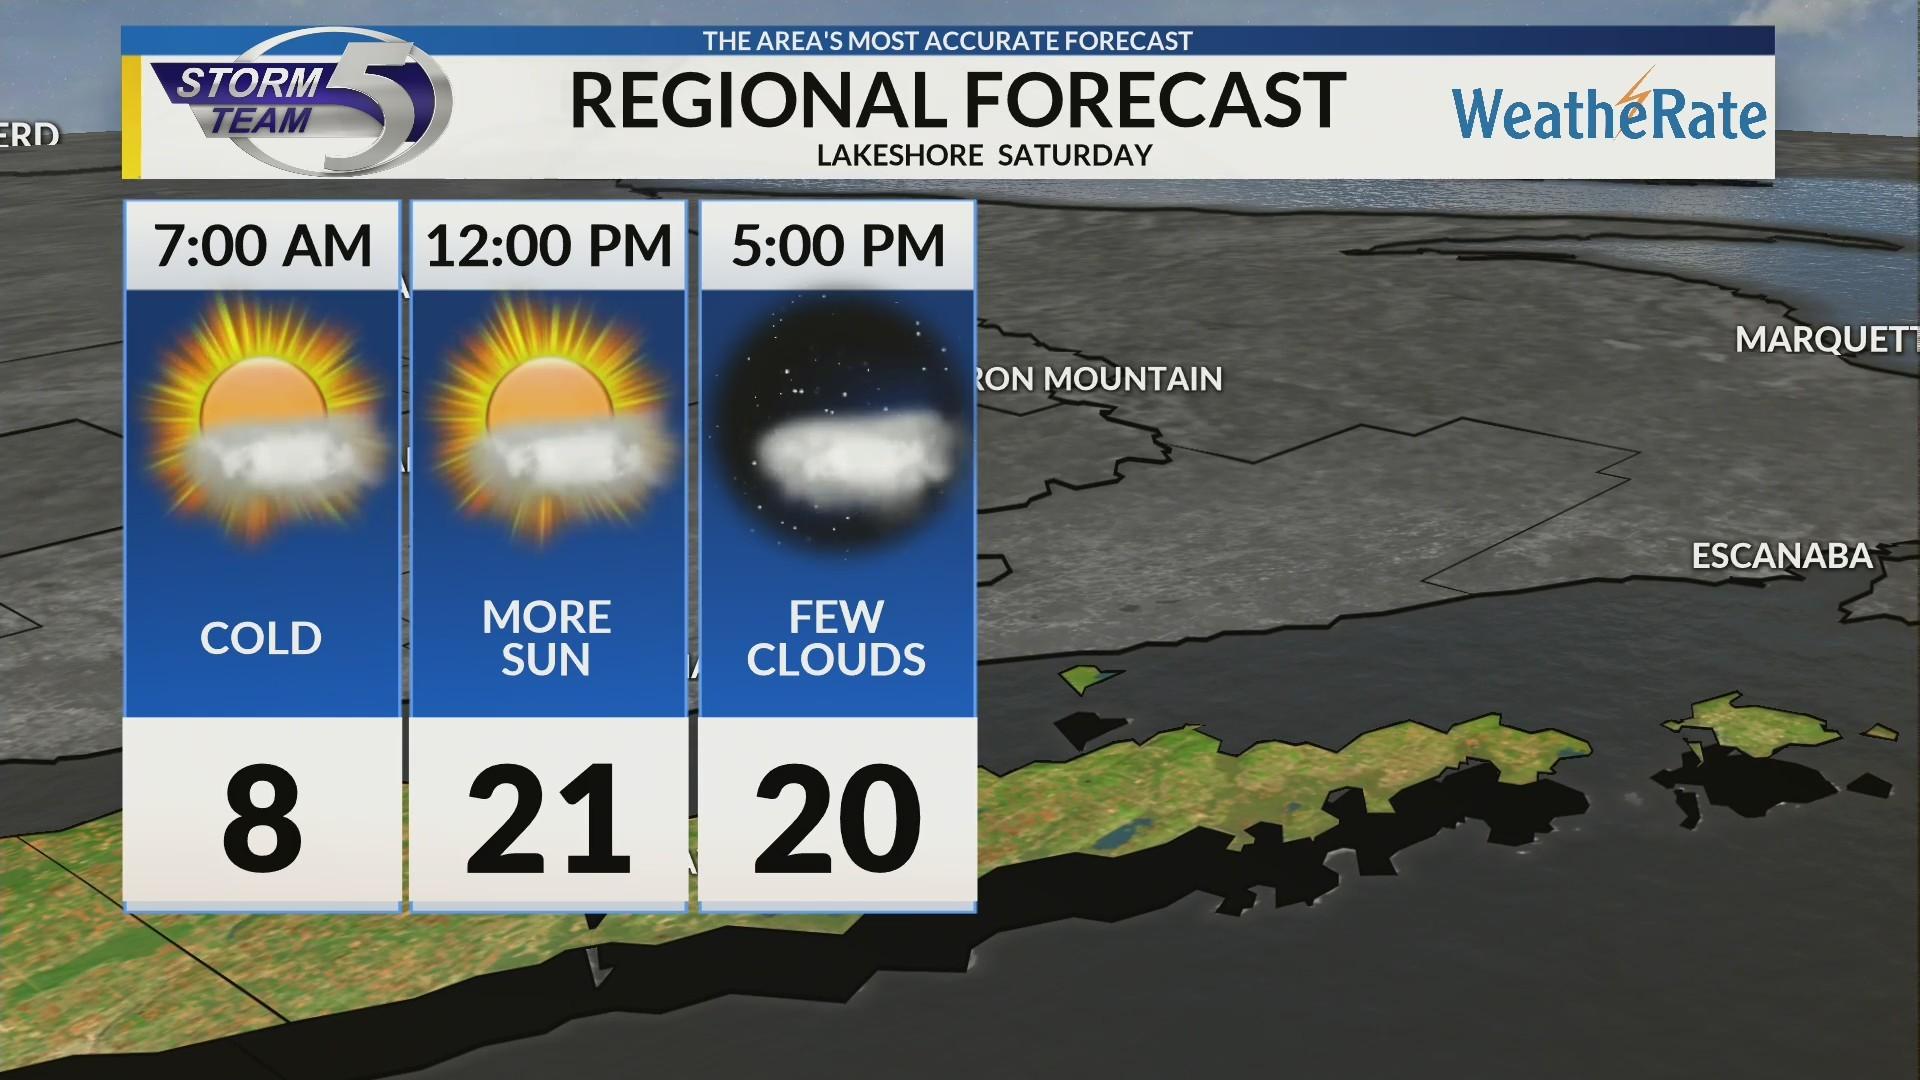 Regional Forecast: Lakeshore 2/16/2019